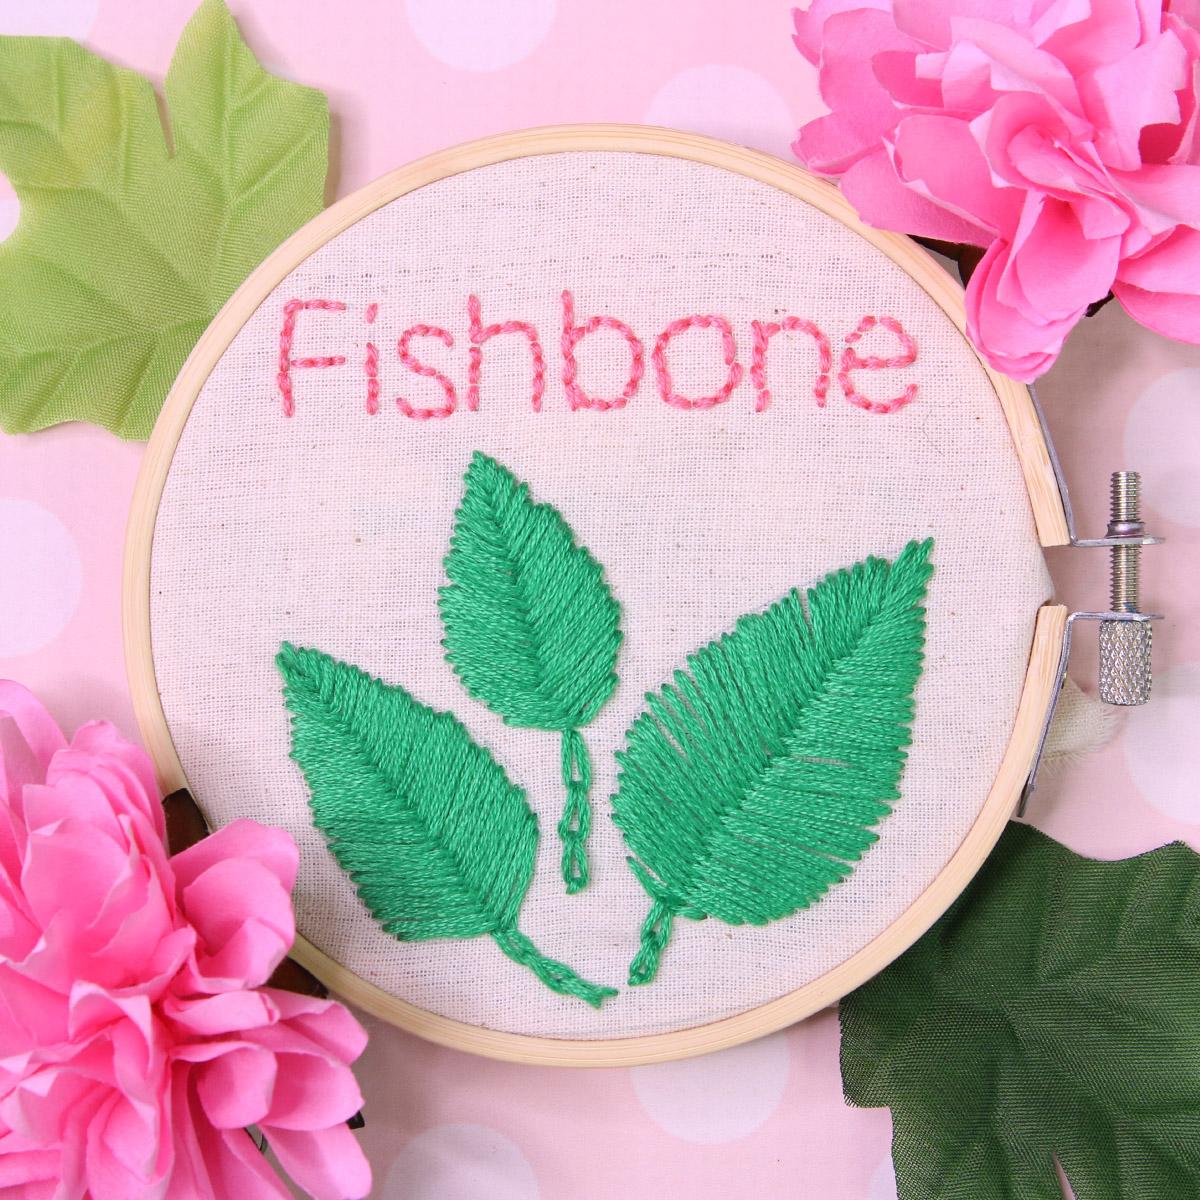 Fishbone Stitch | Embroidery Tutorial |TREASURIE